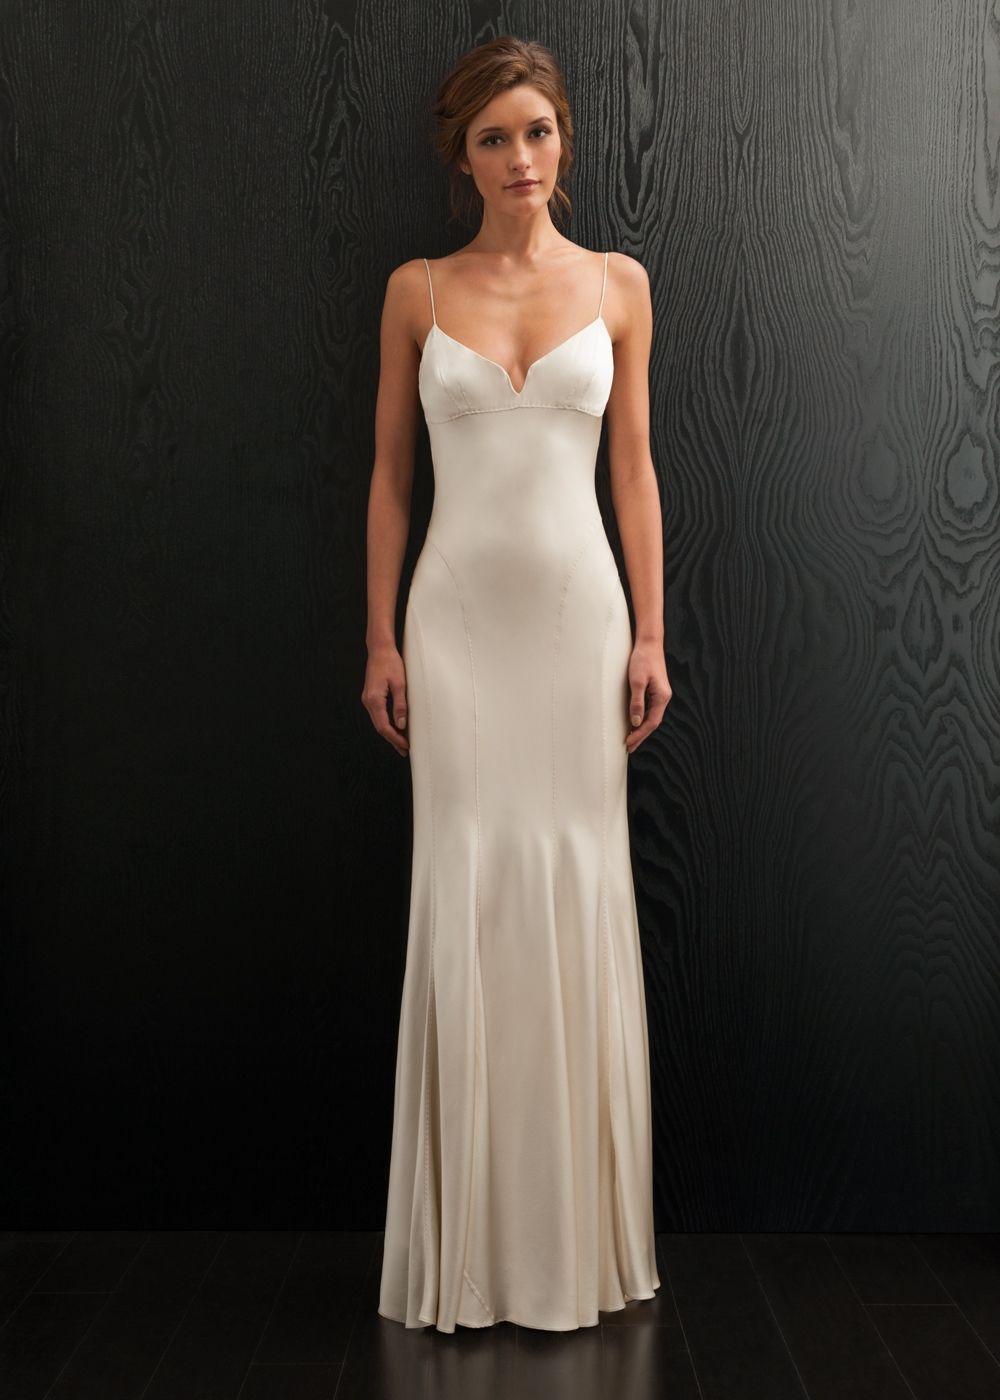 Simple silk wedding dresses  simple biascut silk dress  You must have JavaScript enabled in